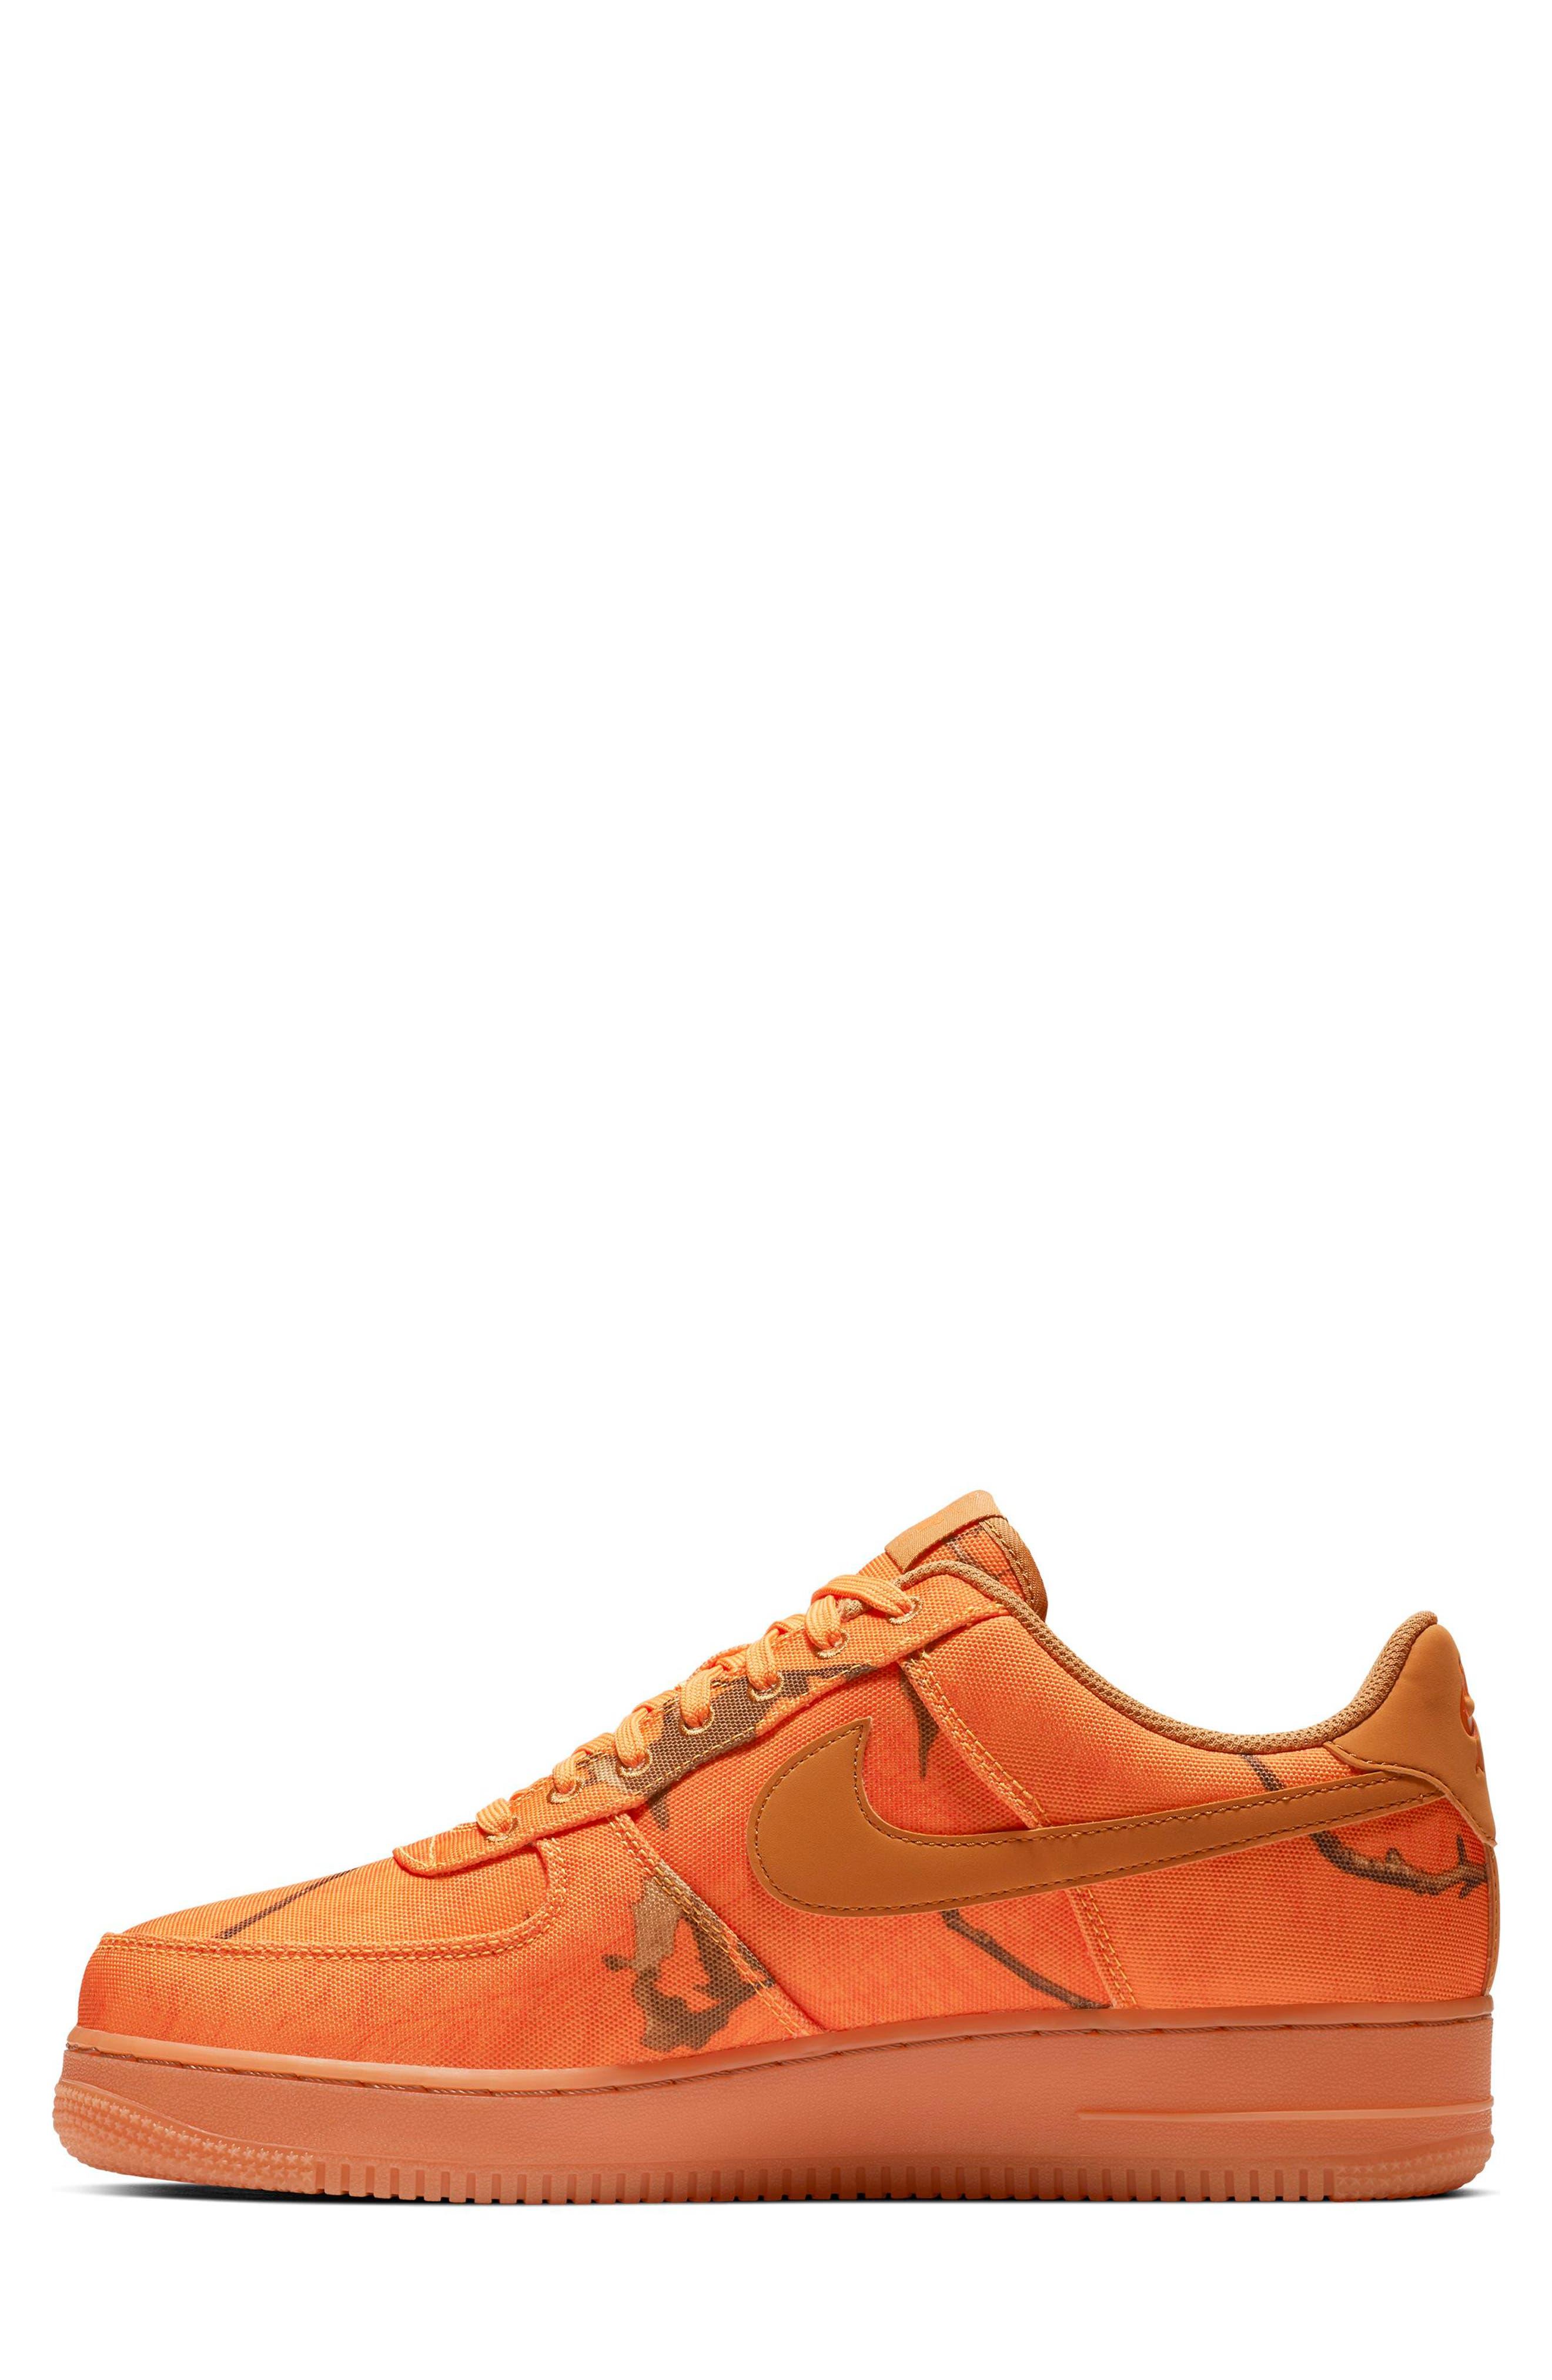 NIKE,                             Air Force 1 '07 LV8 3 Sneaker,                             Alternate thumbnail 3, color,                             ORANGE BLAZE/ WHITE/ BROWN